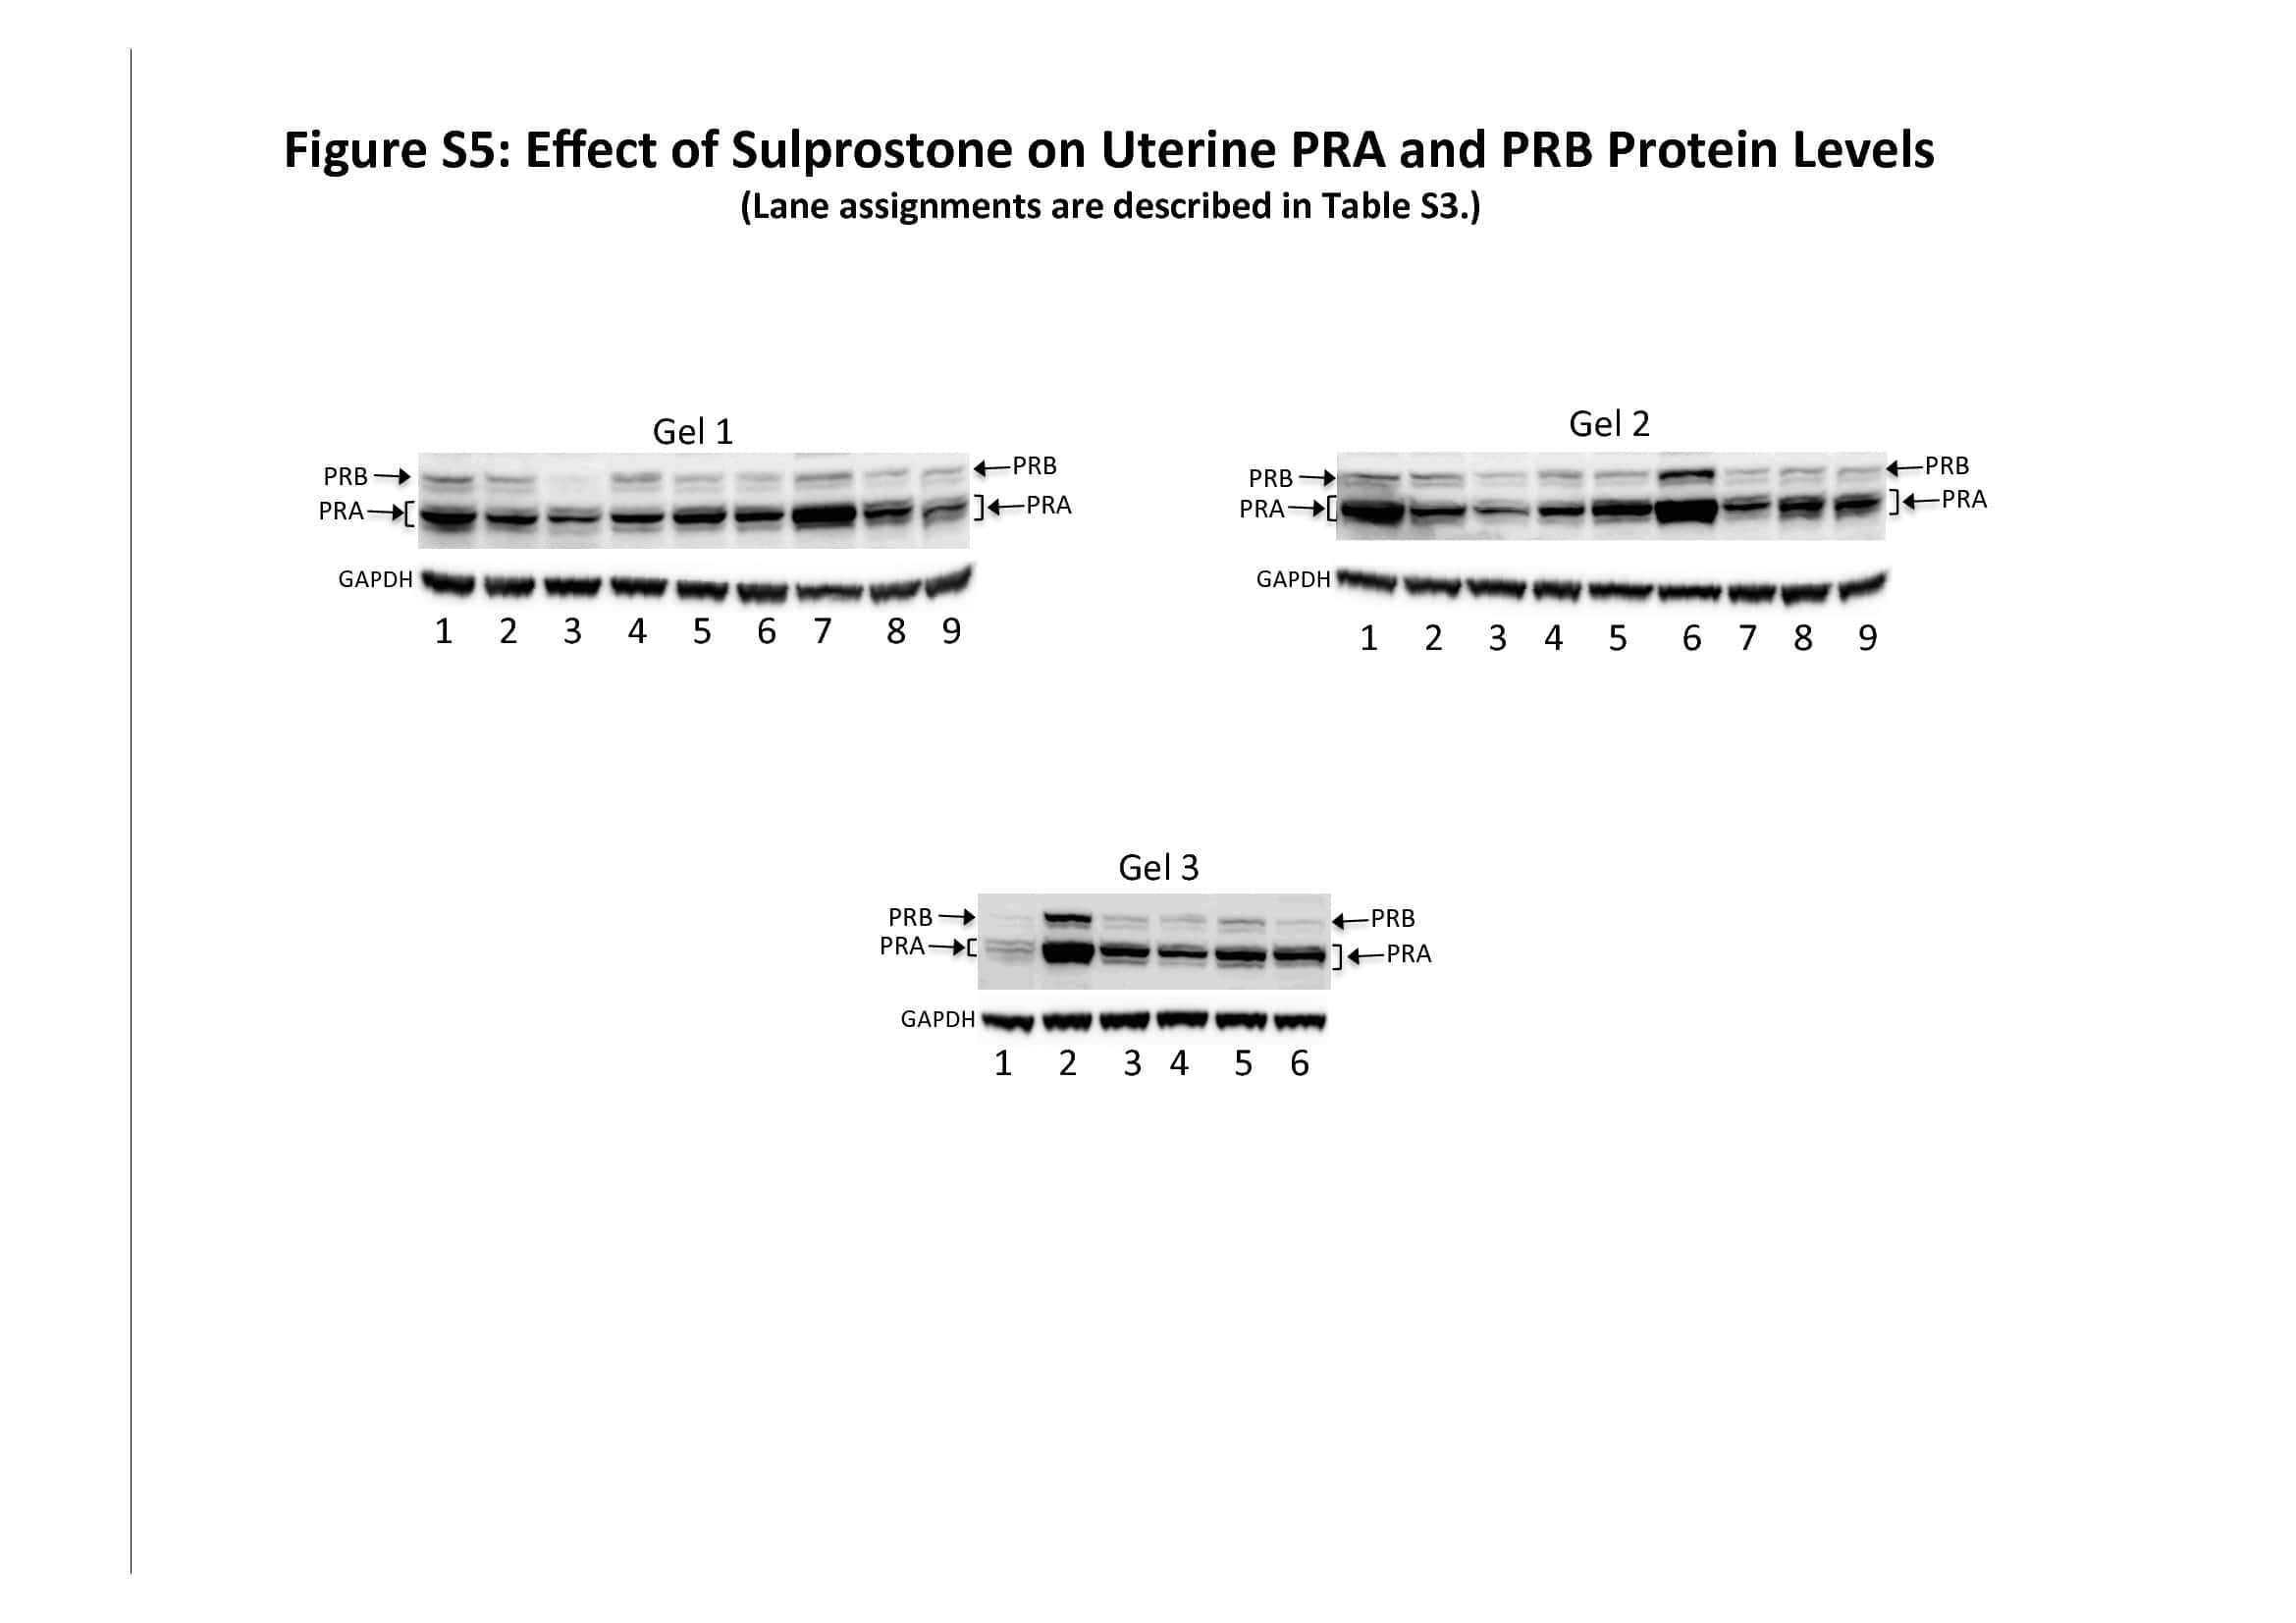 Progesterone Receptor Antibody